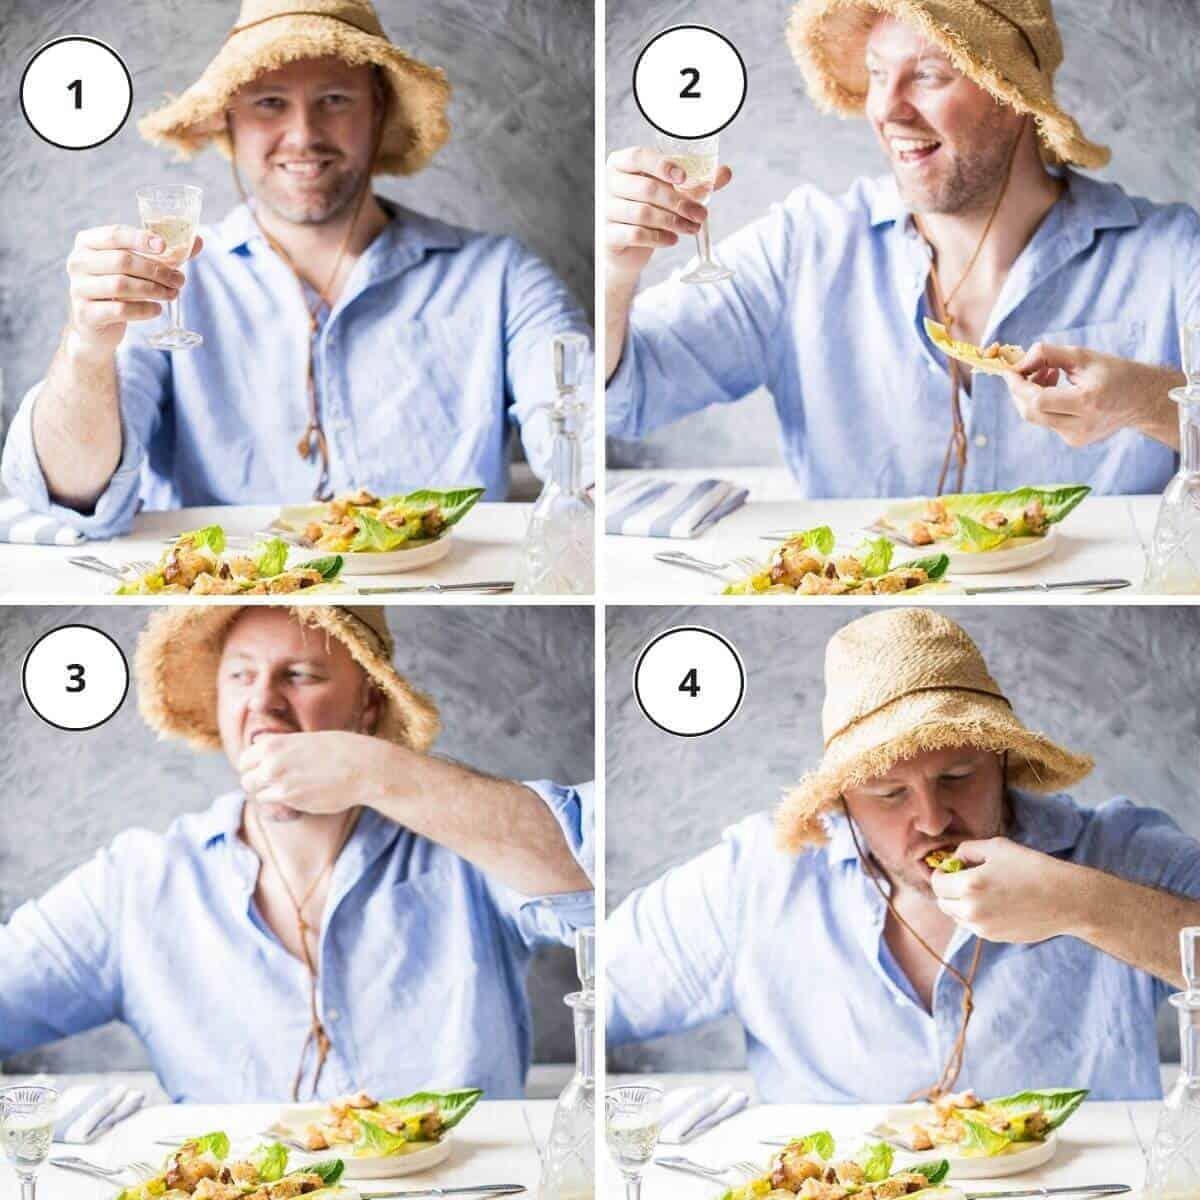 man with blue shirt eating salad